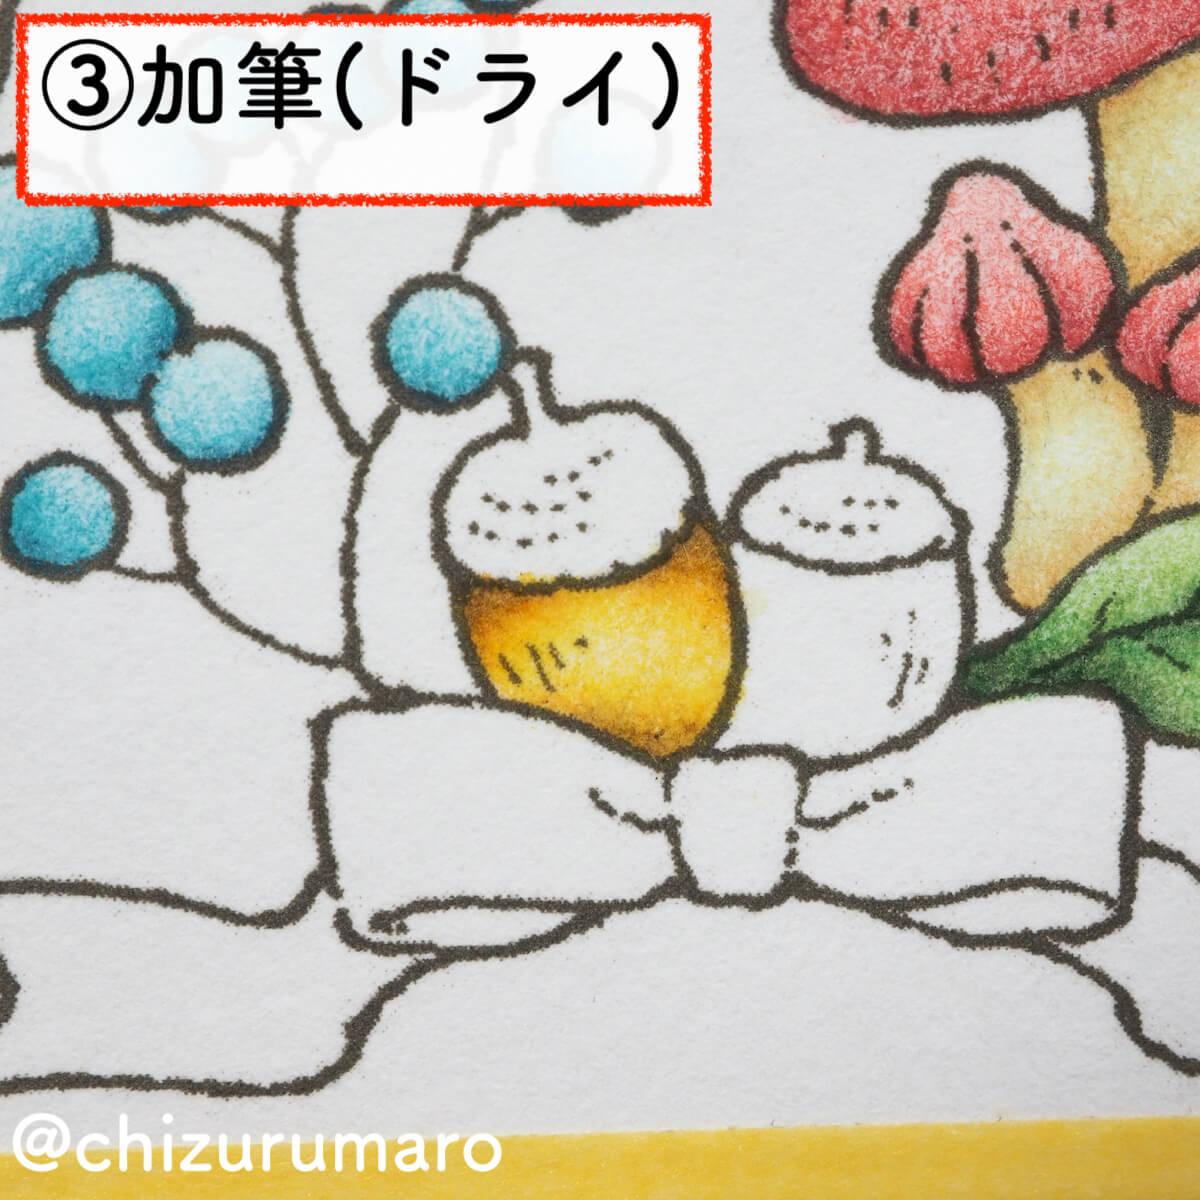 f:id:chizurumaro:20200218125315j:plain